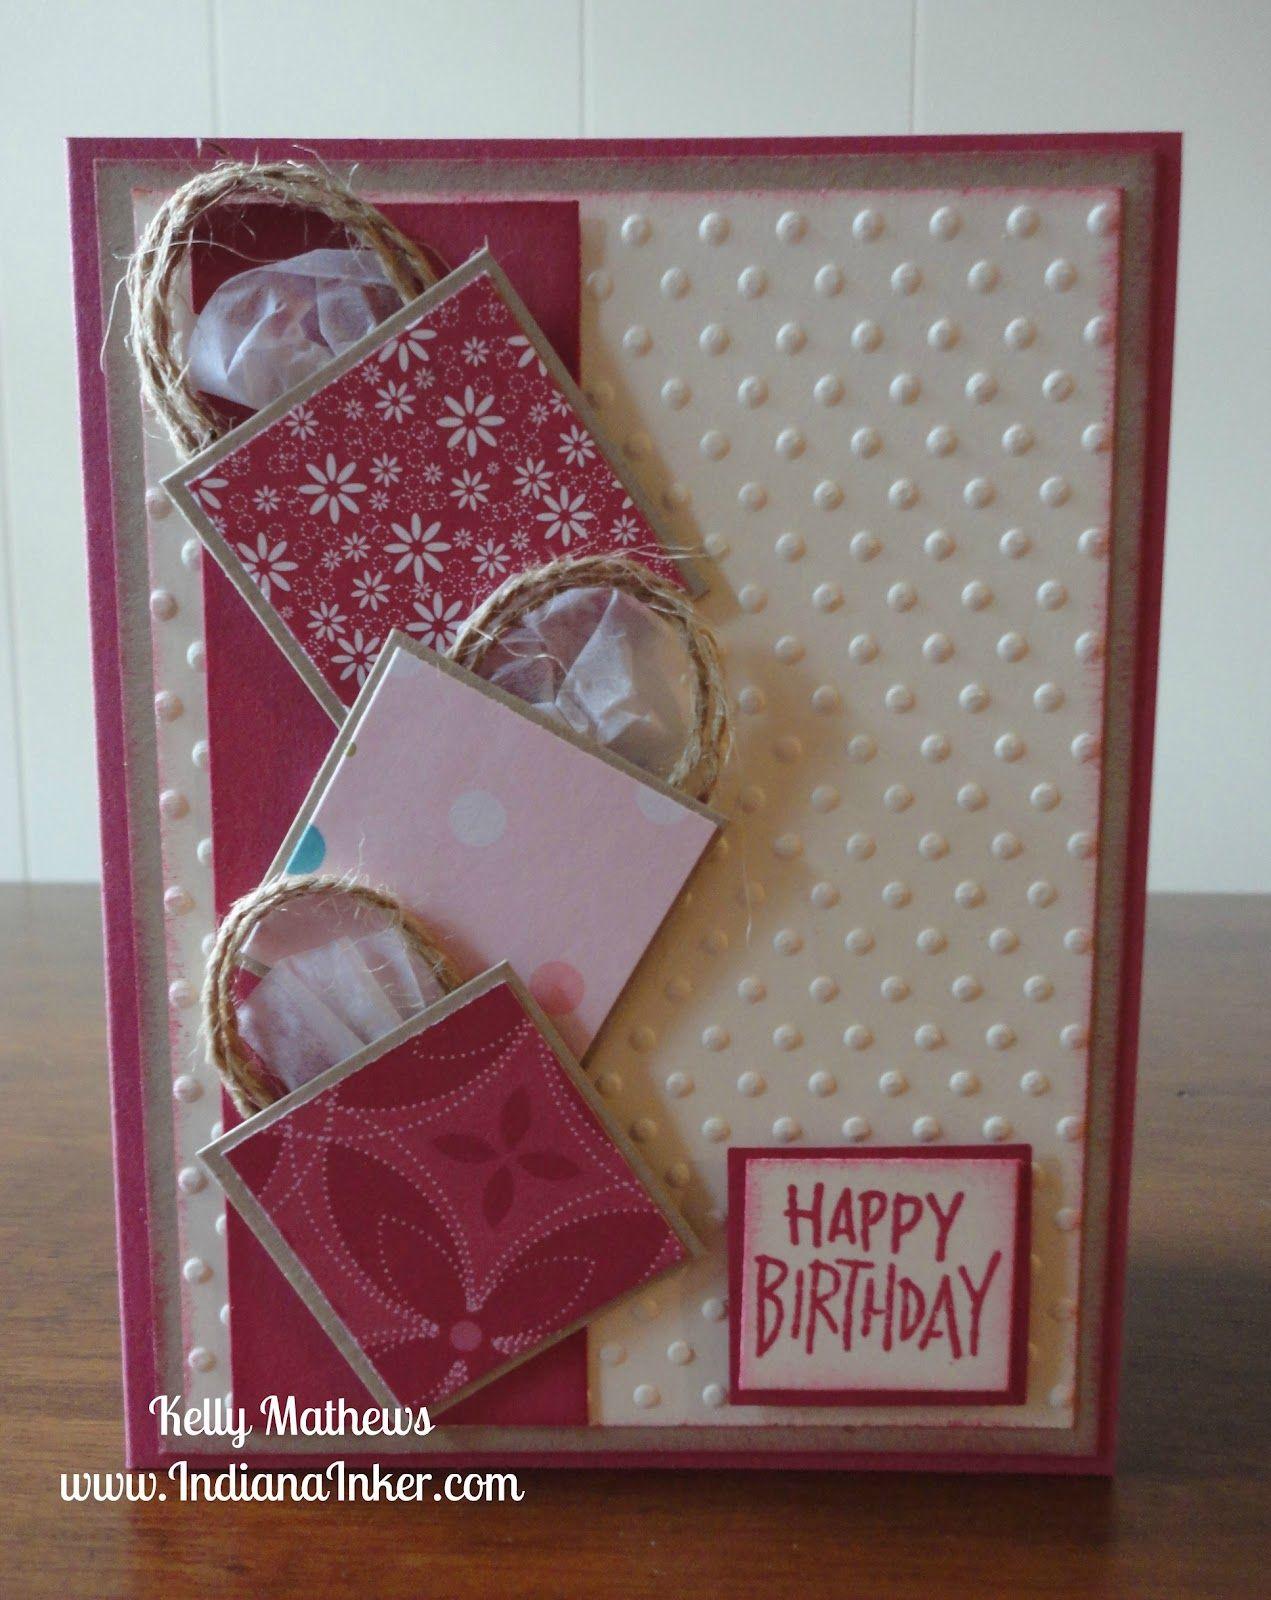 Shopping Bag Birthday Card Stampin Up Birthday Cards Embossed Cards Birthday Cards For Women